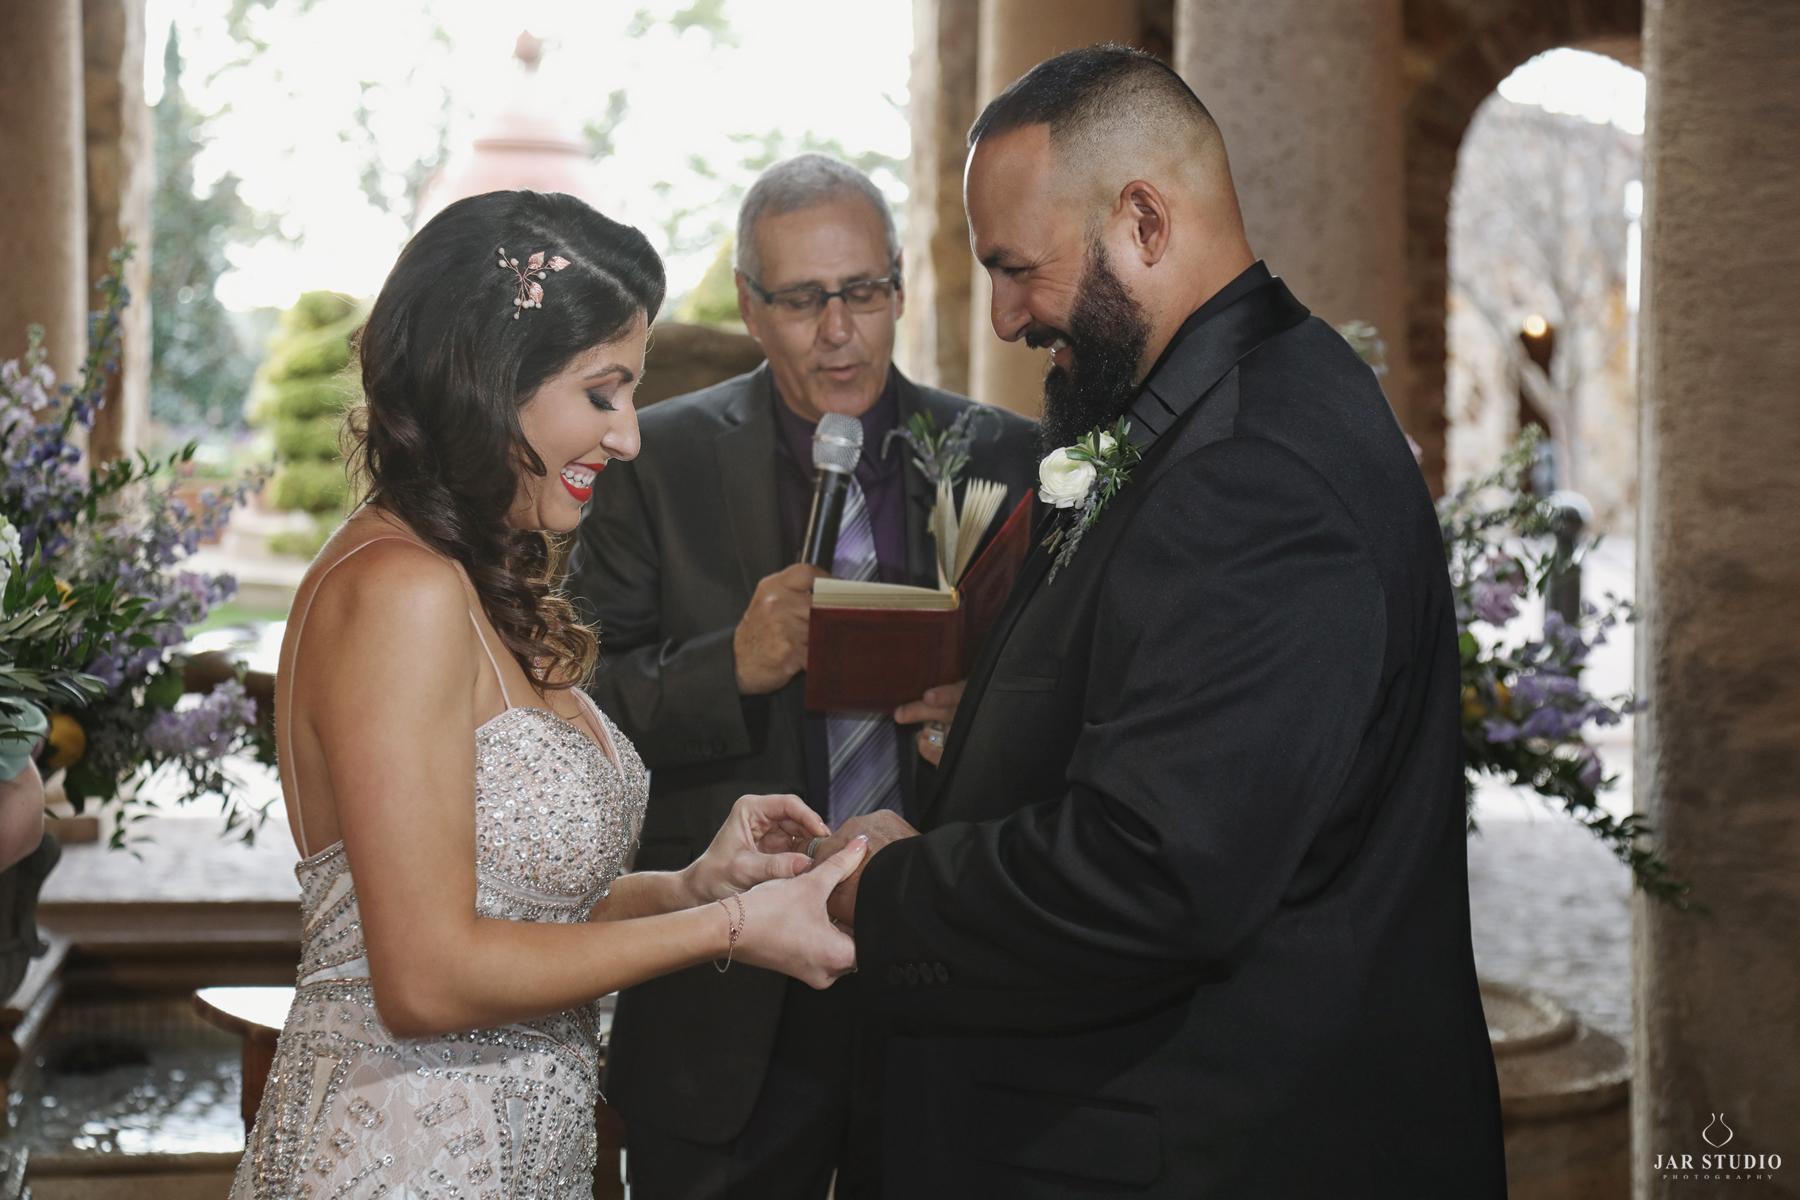 13-wedding-rings-ceremony-real-fun-moment-jarstudio-photography.jpg